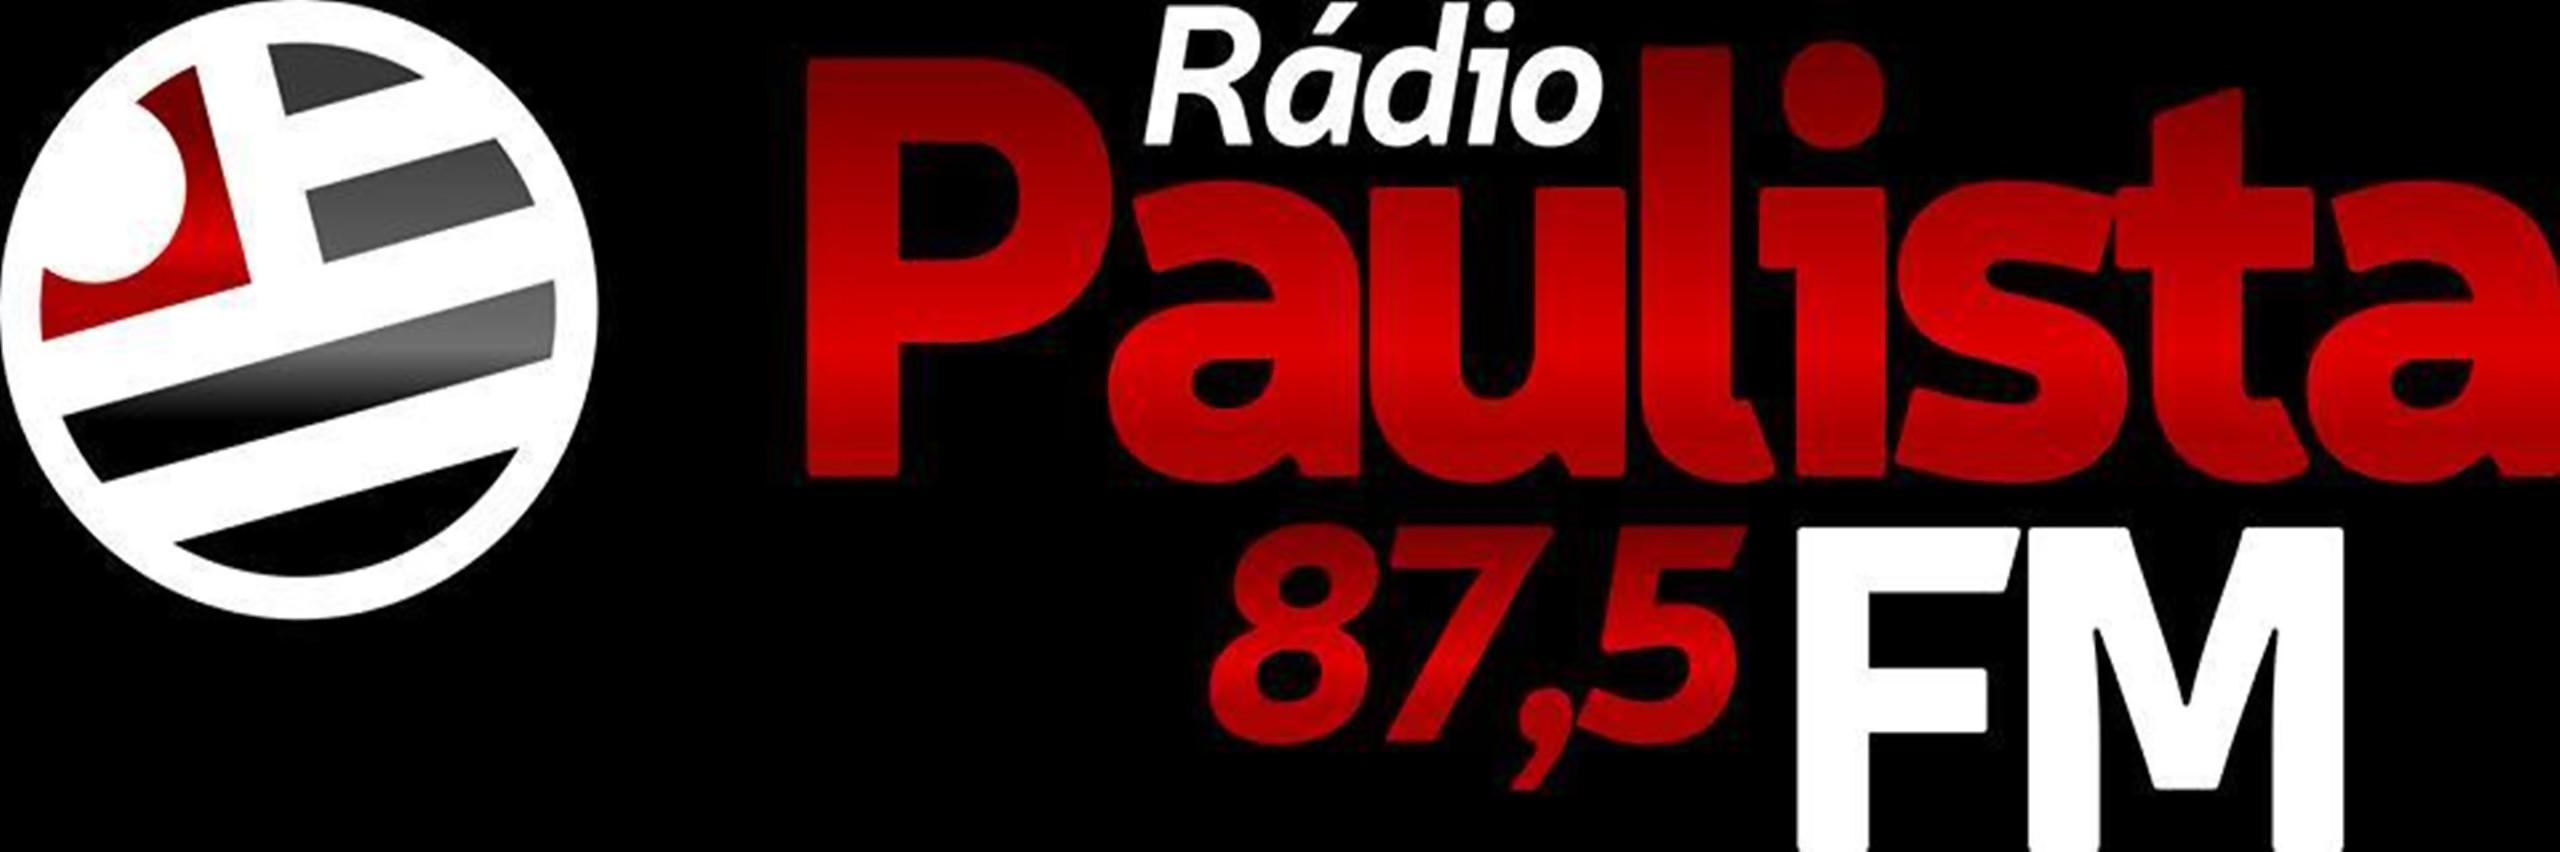 PAULISTA FM 87